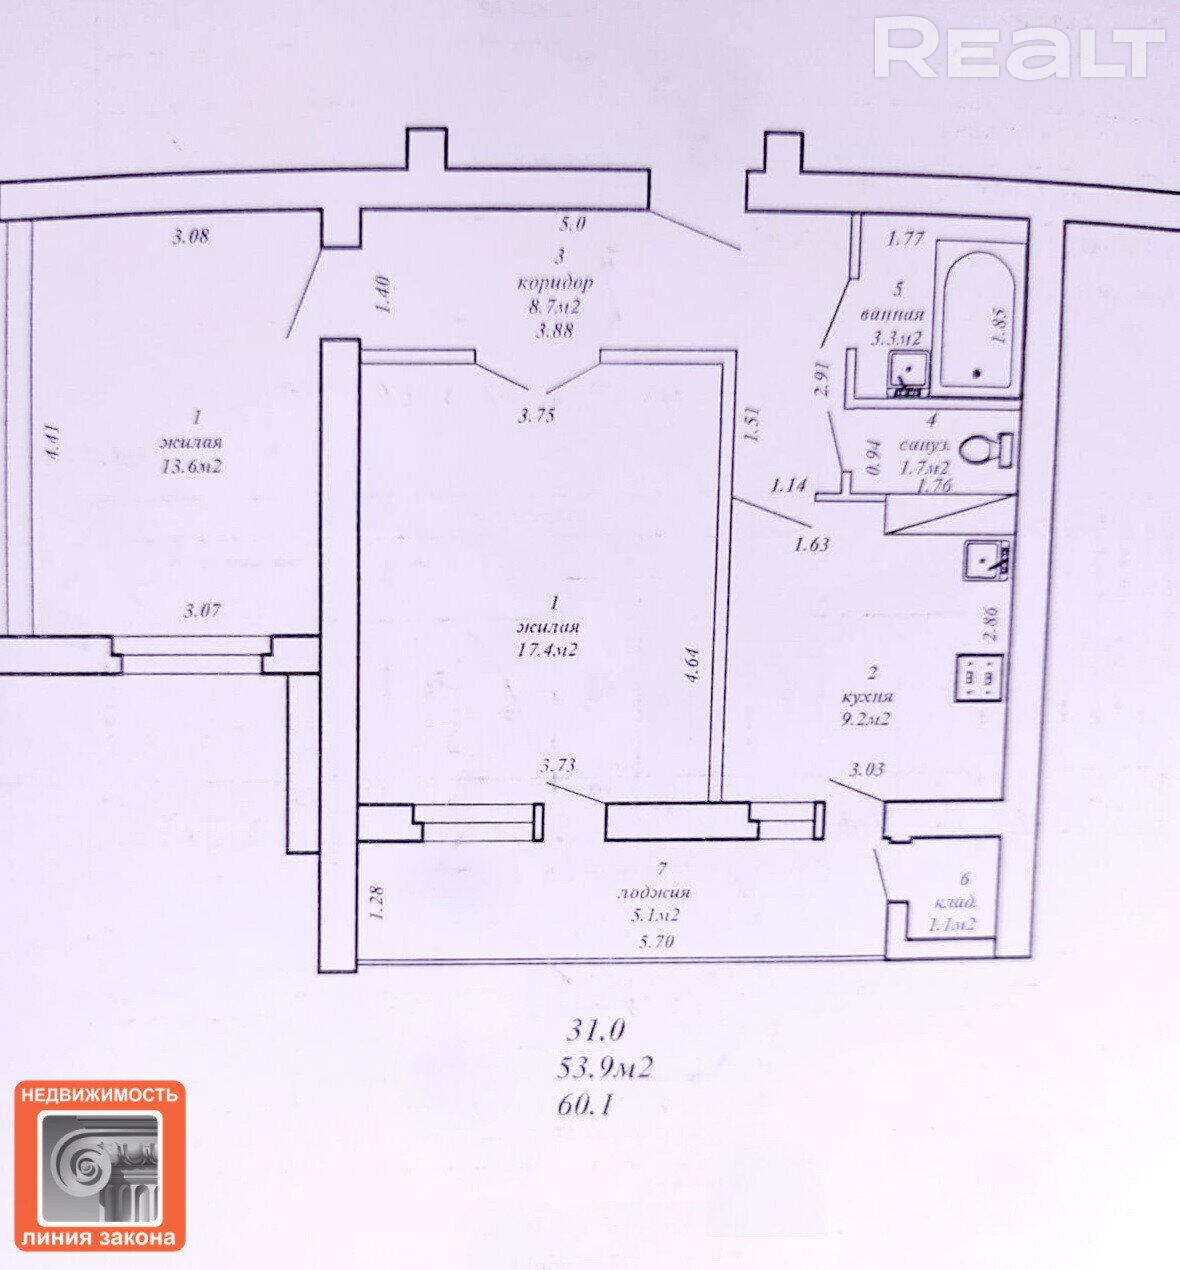 Продажа 2-х комнатной квартиры в г. Гомеле, ул. Мазурова, дом 59 (р-н Мельников луг). Цена 125 010 руб